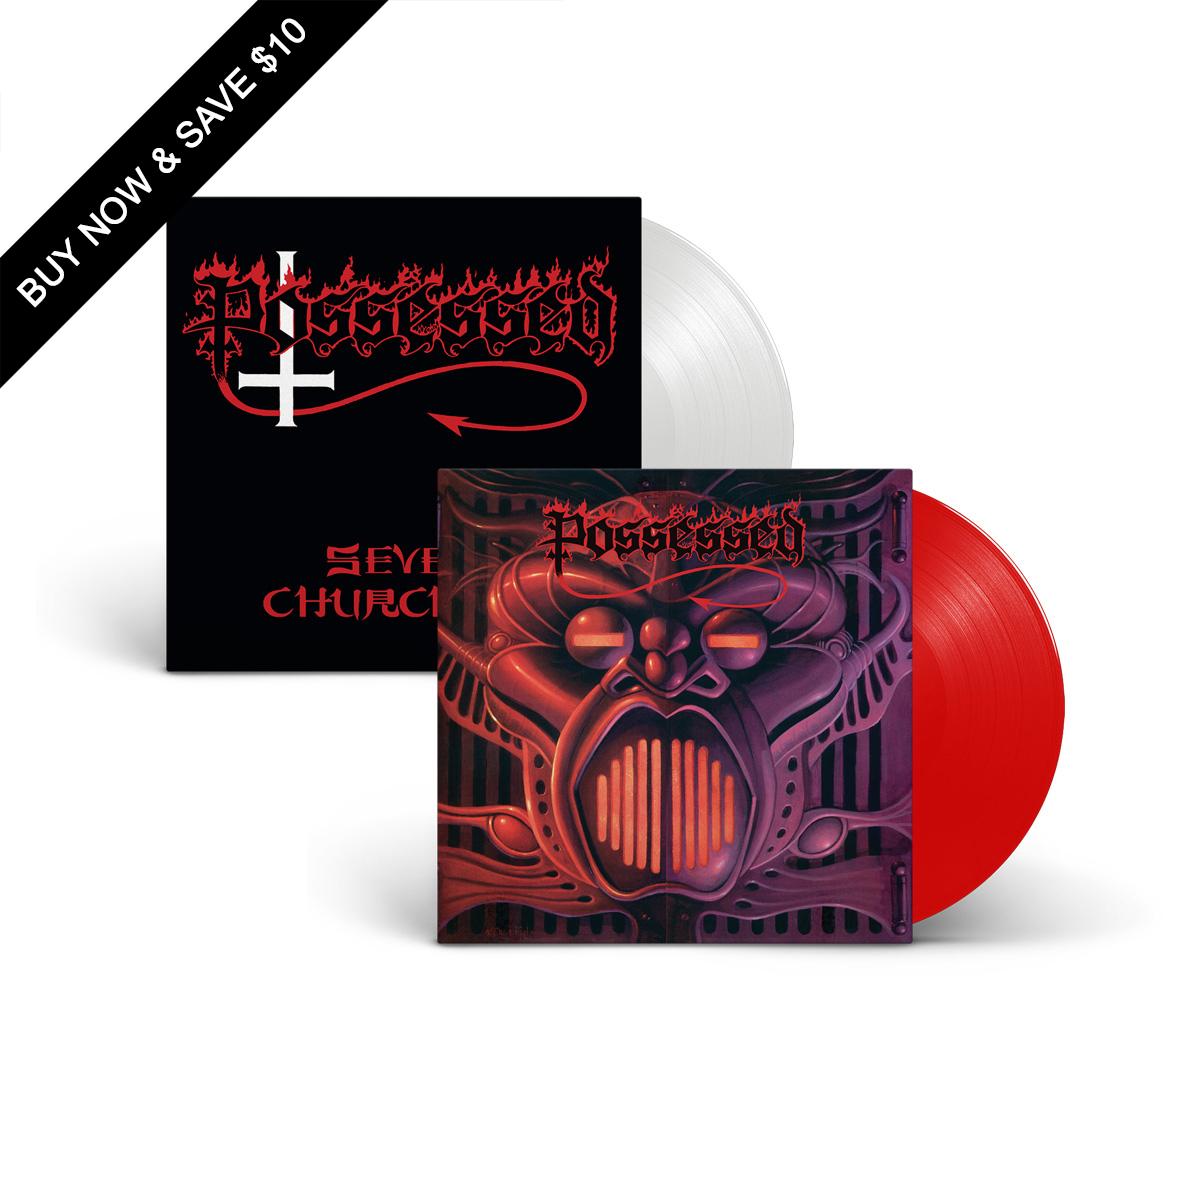 Possessed - Vinyl Re-Issue Bundle